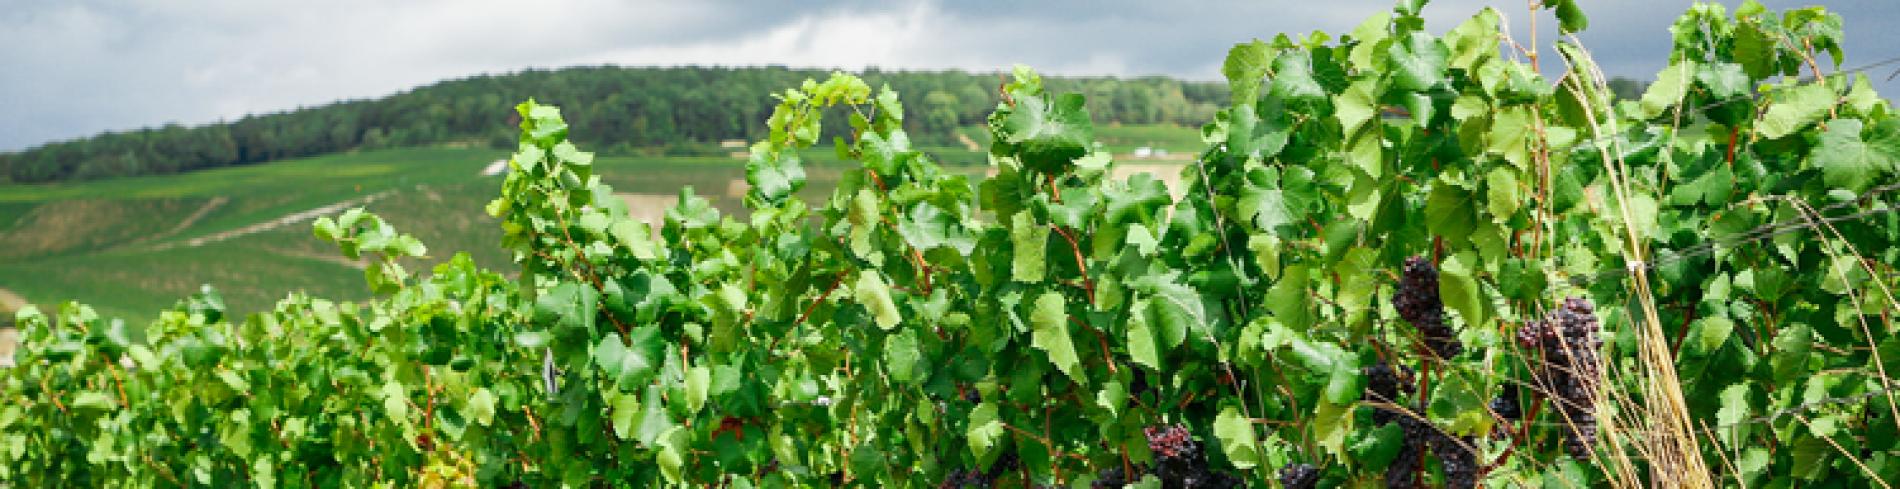 Vineyards in Champagne